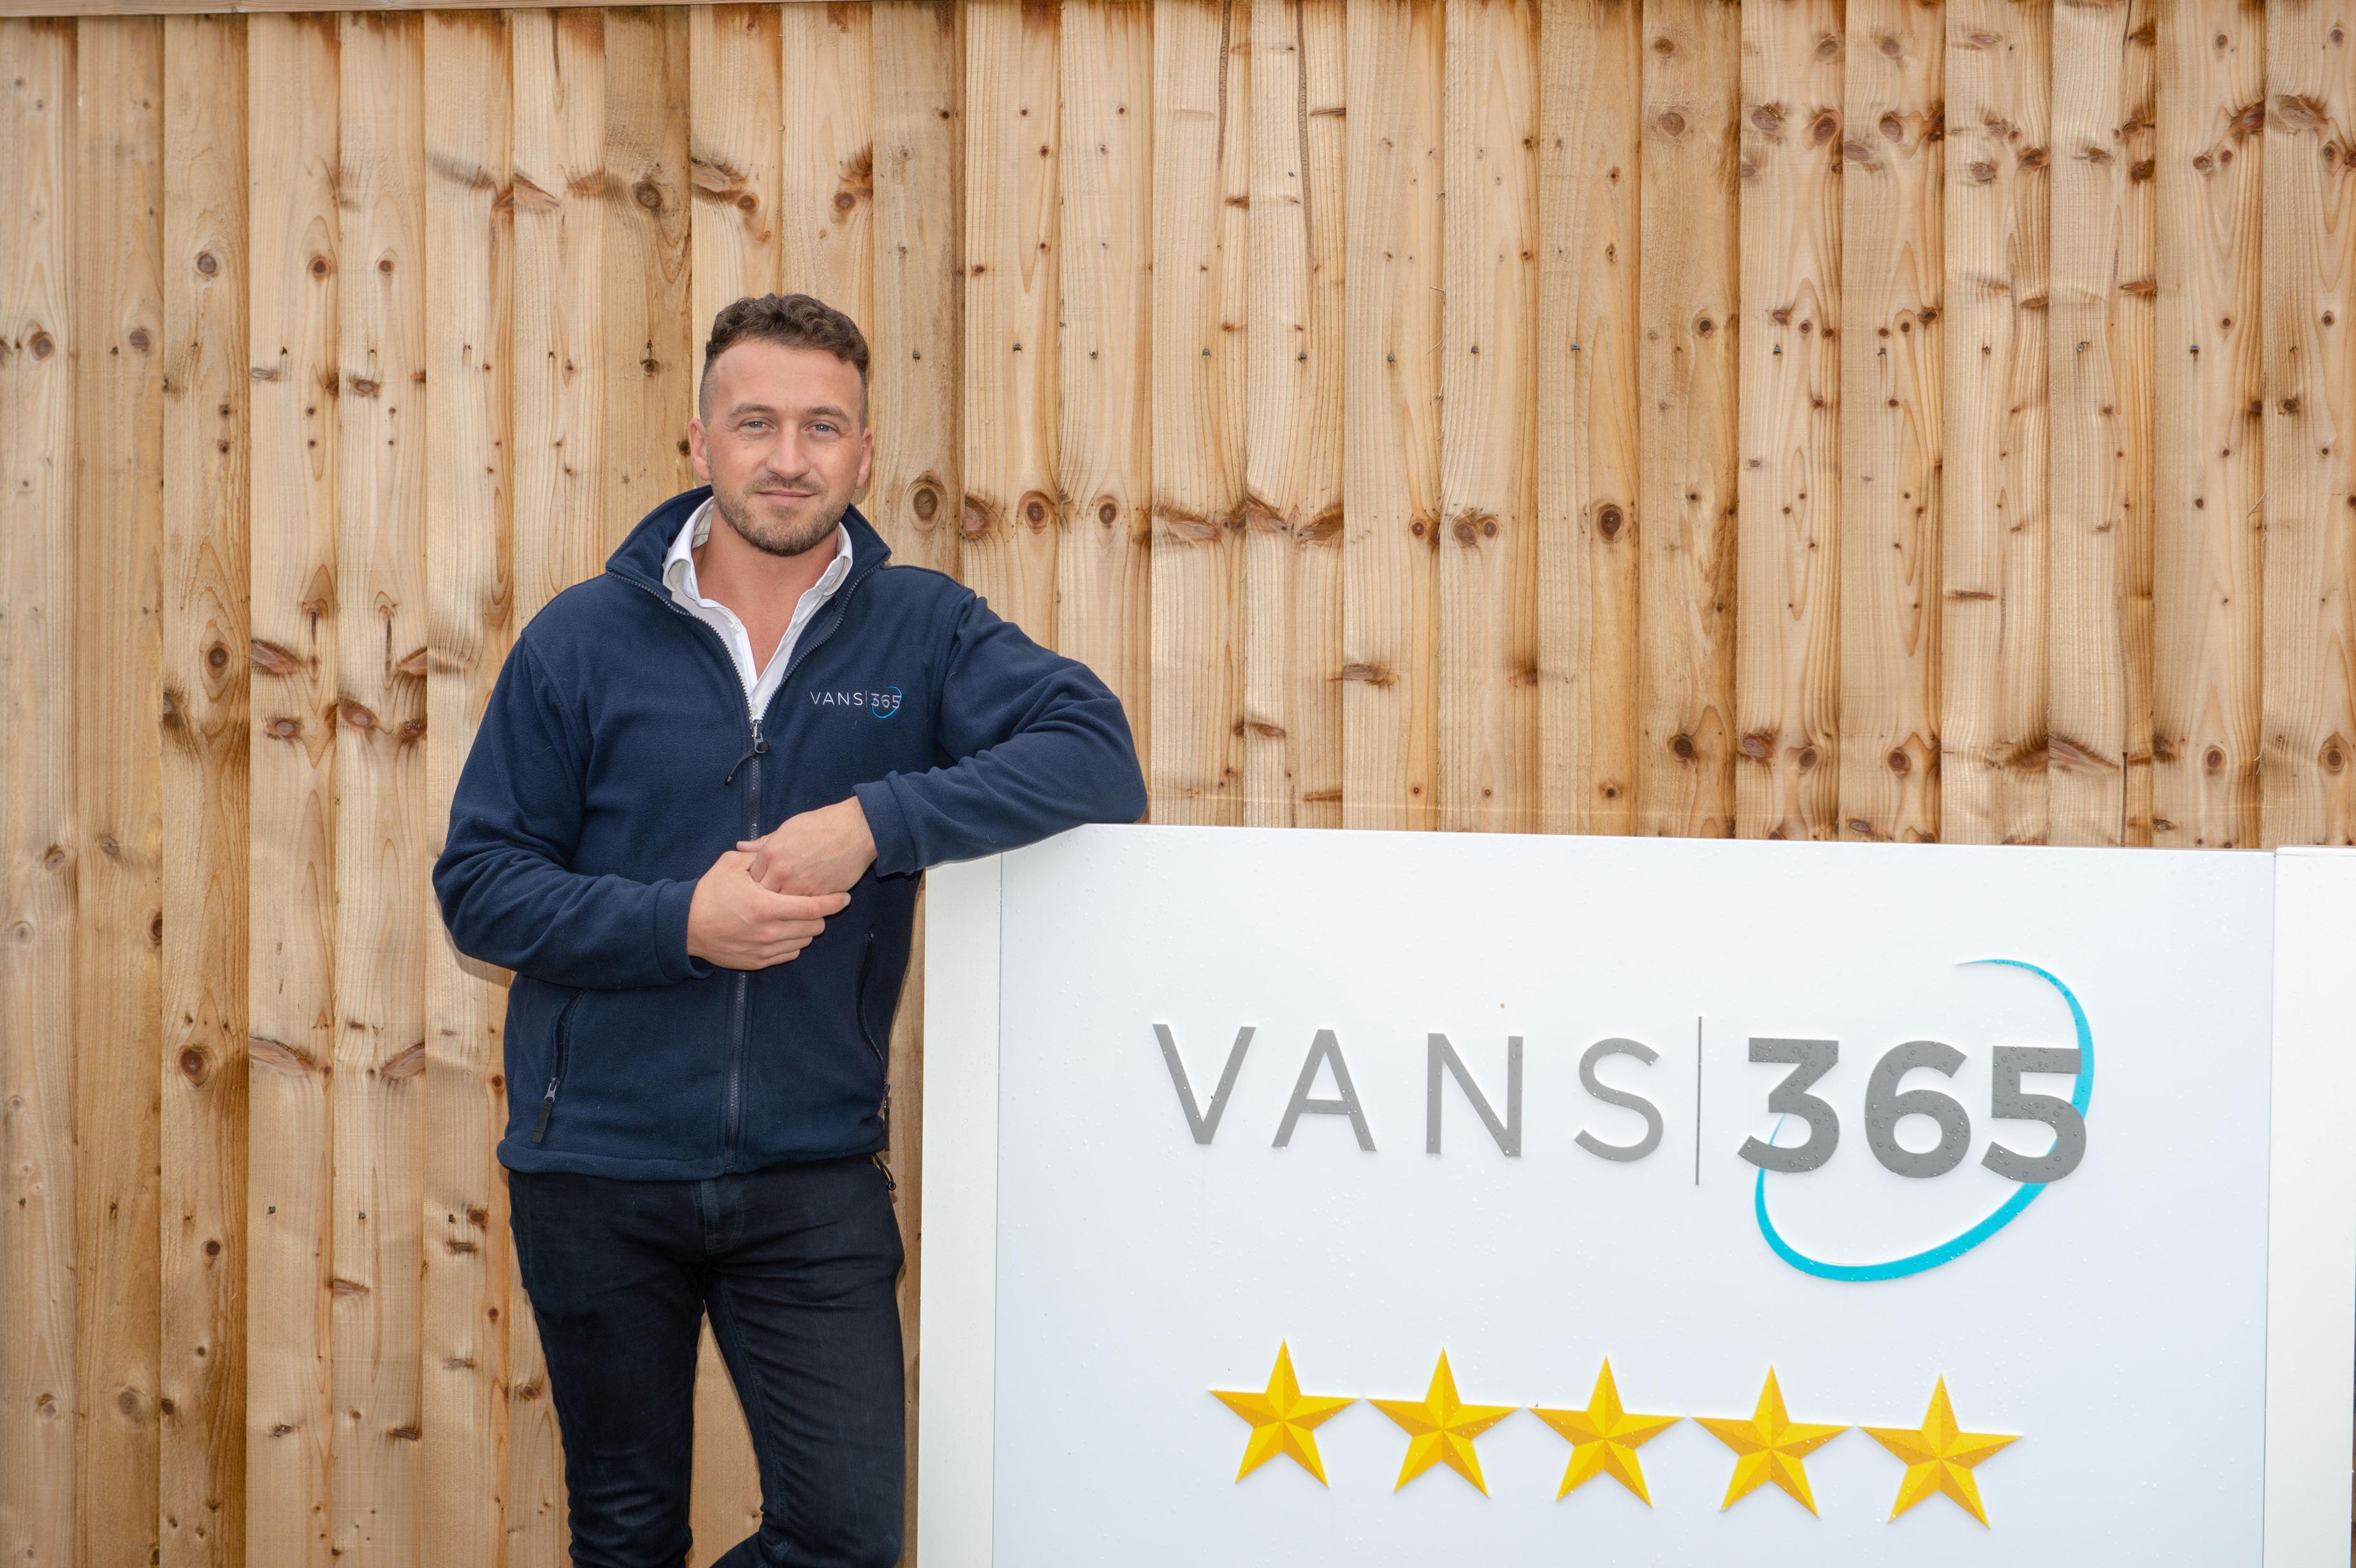 Jordon Managing Director of Vans 365